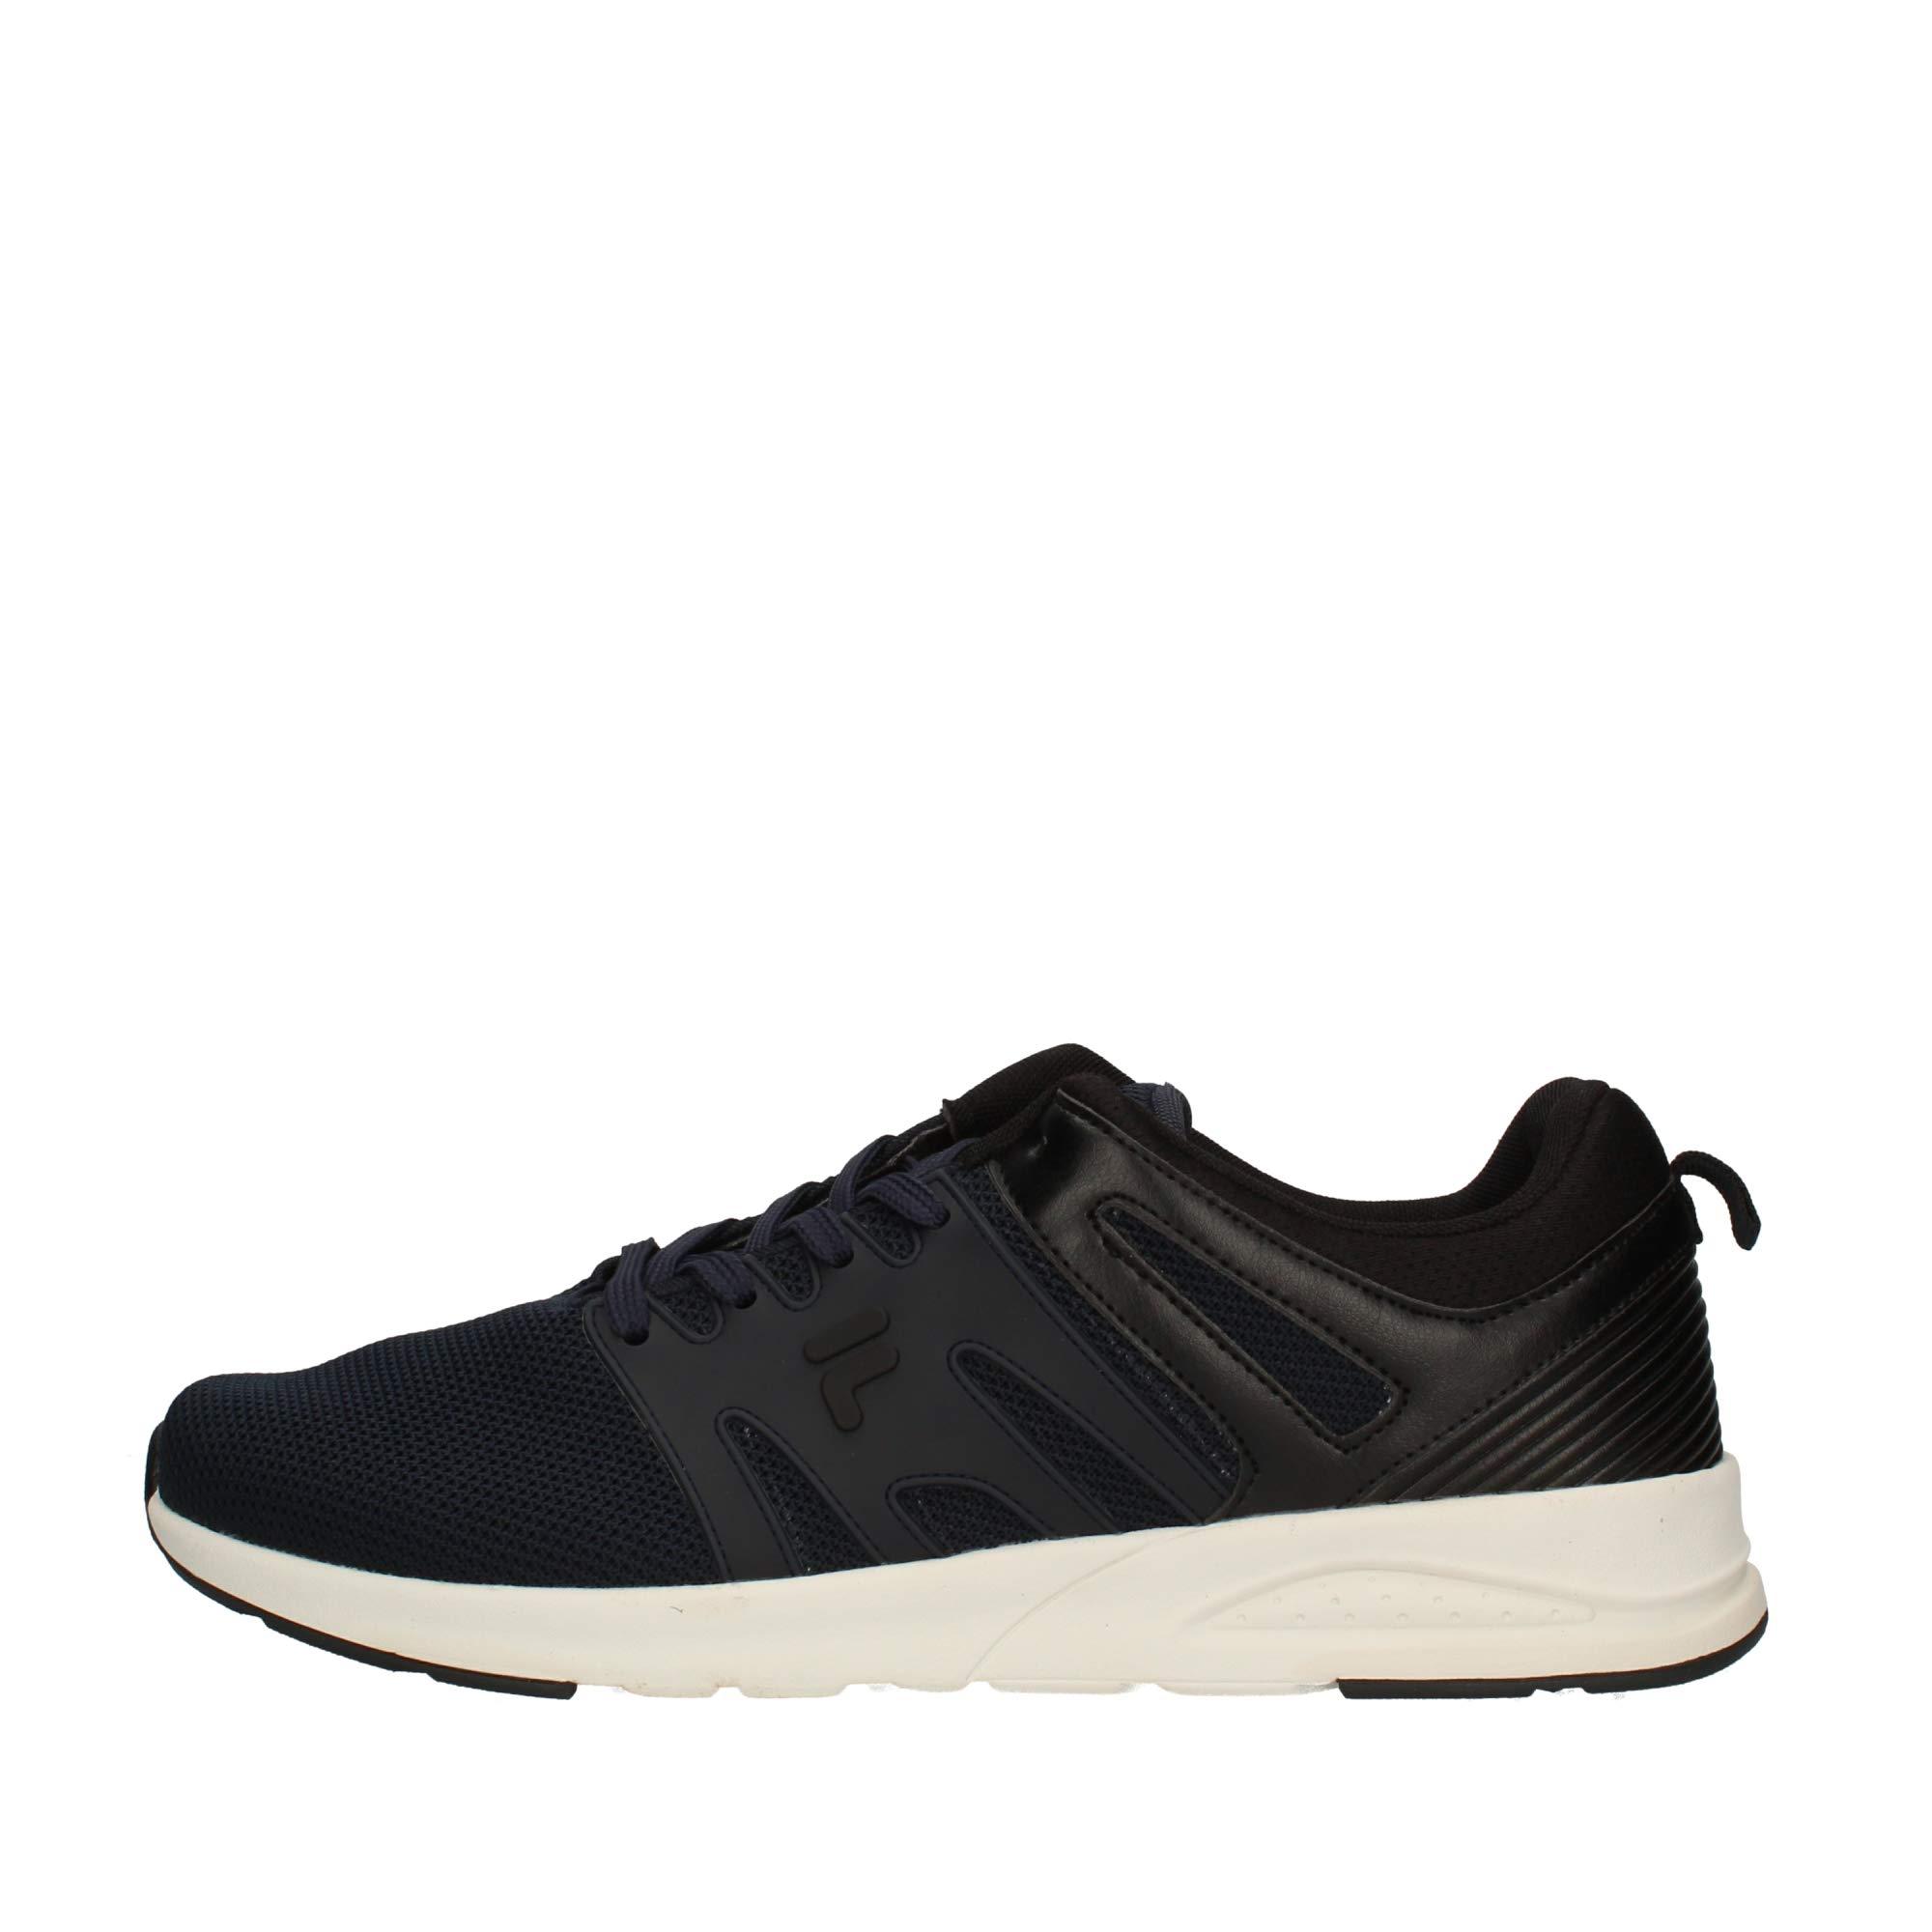 Fila 1010513 Sneakers Man